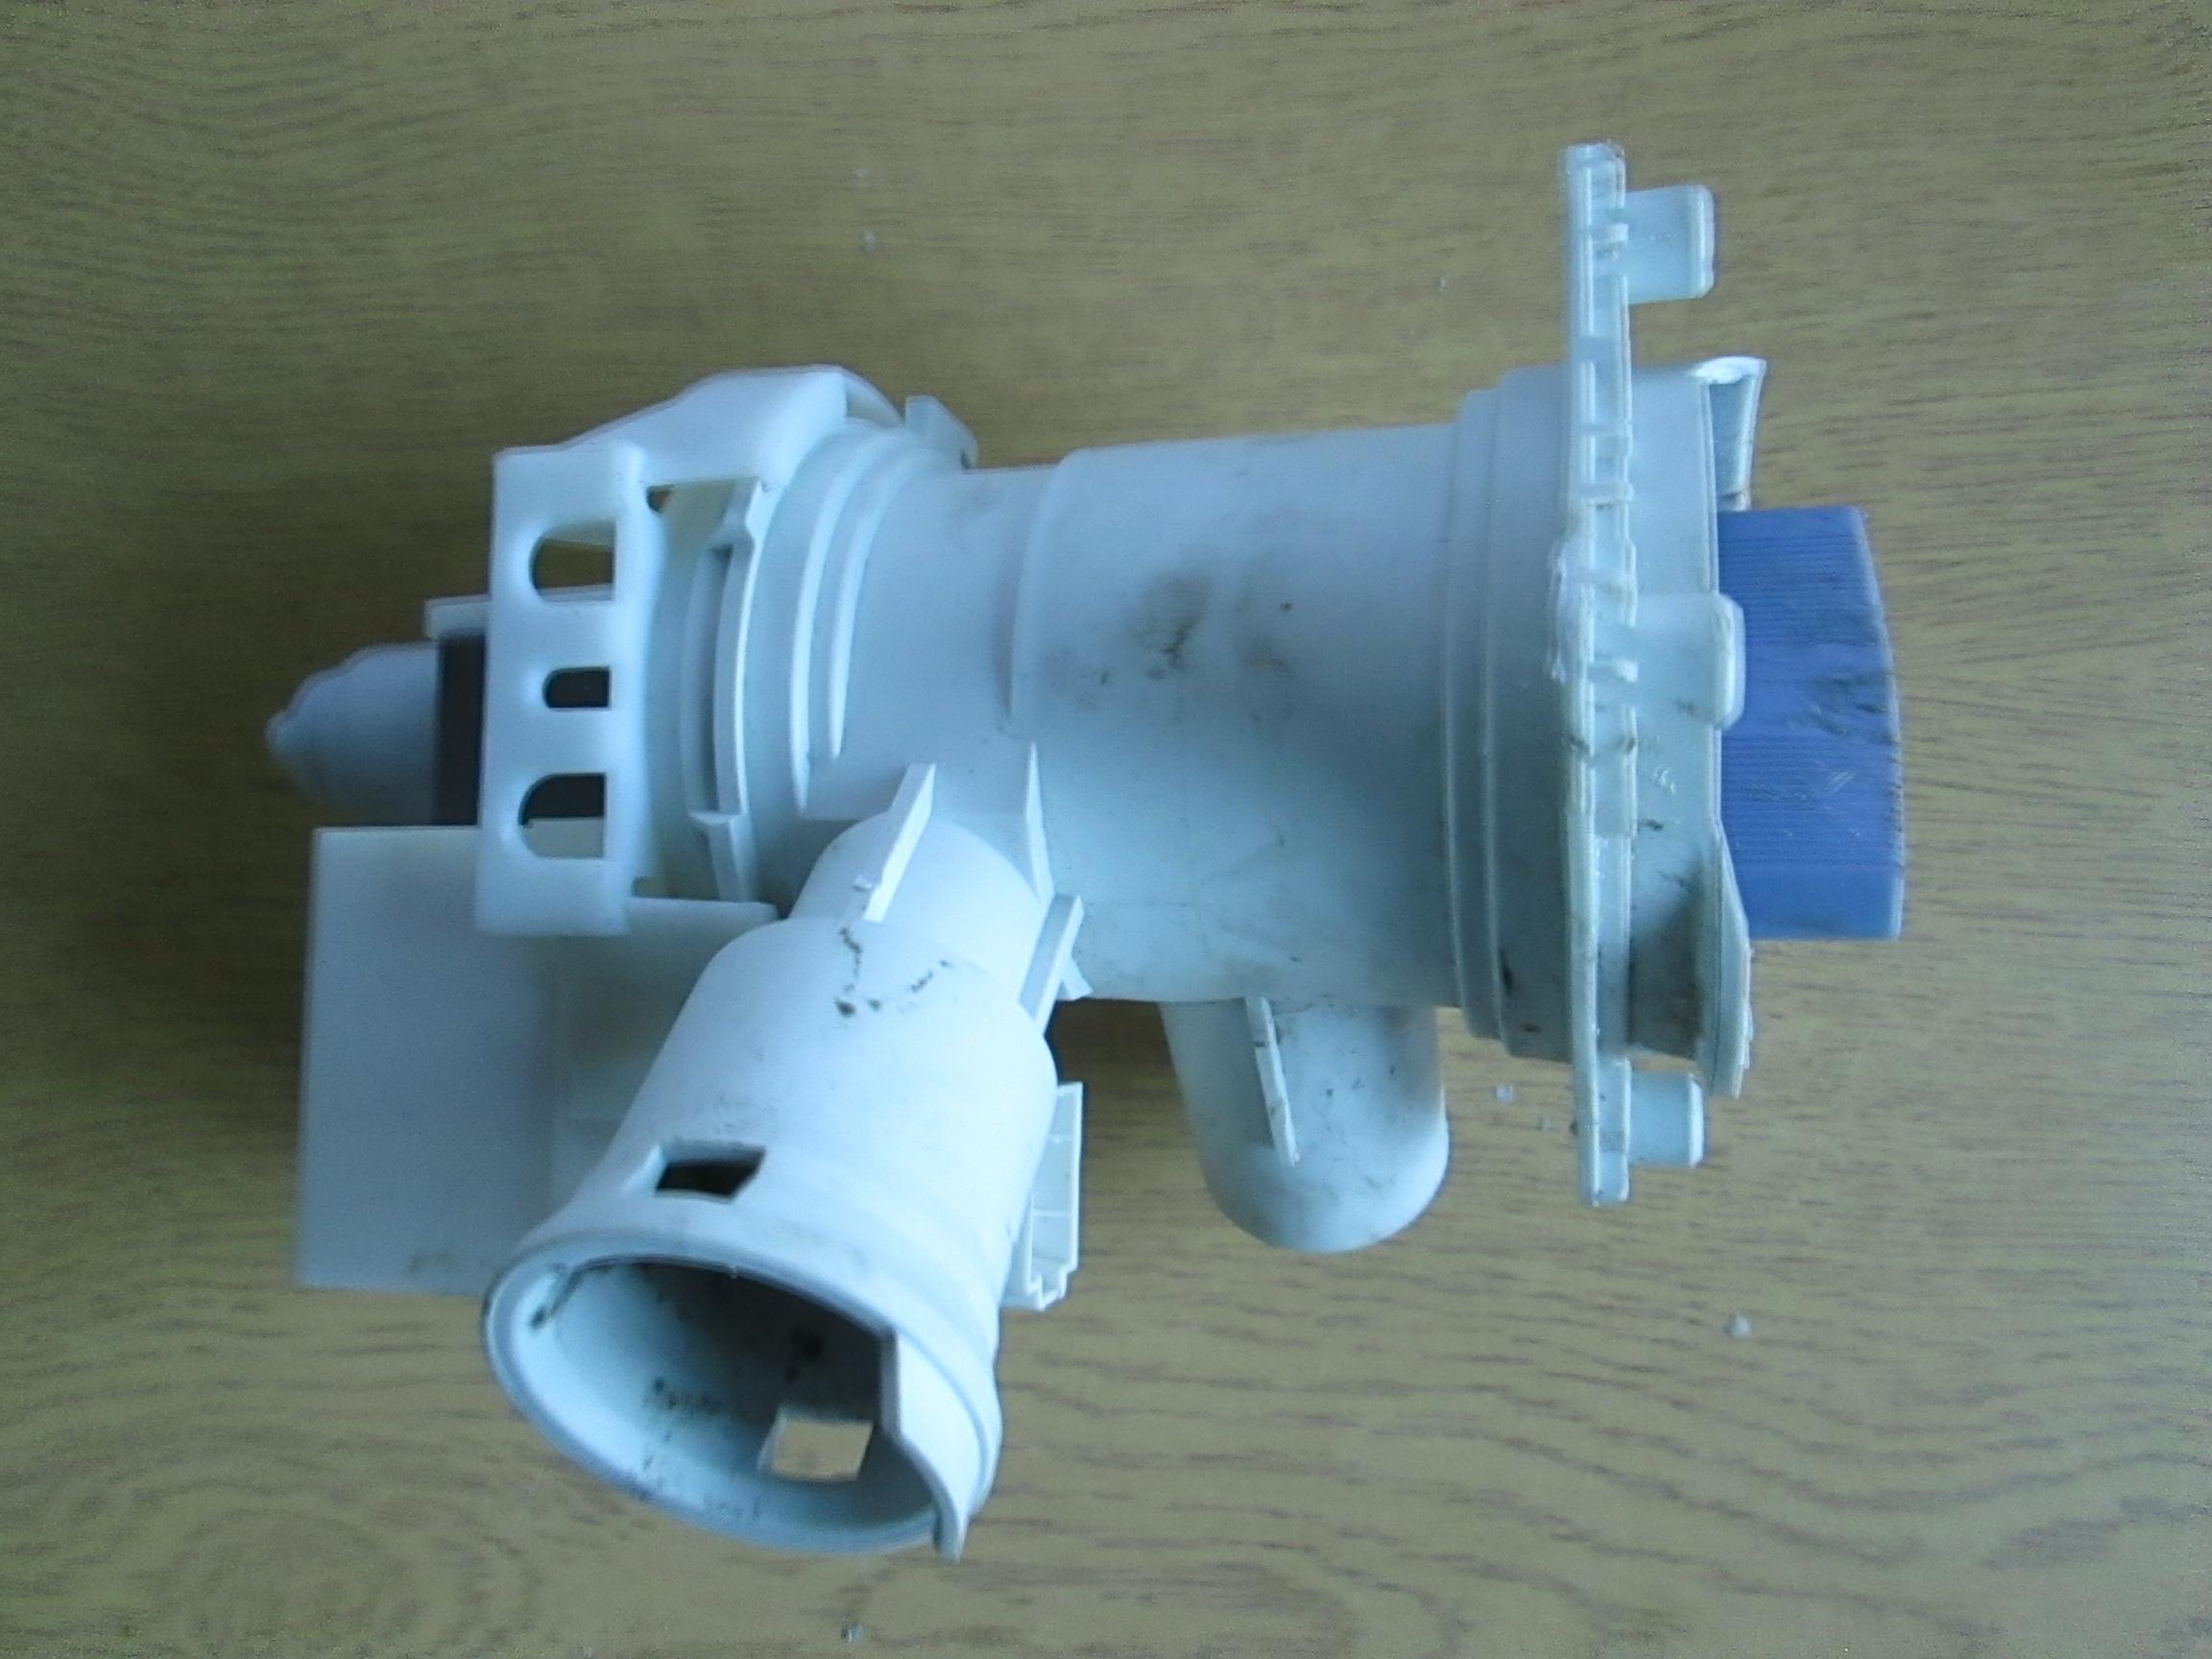 Bosch Washing Machine Pump WAS32461GB//10 WAS32461GB//13 WAS32461GB//14